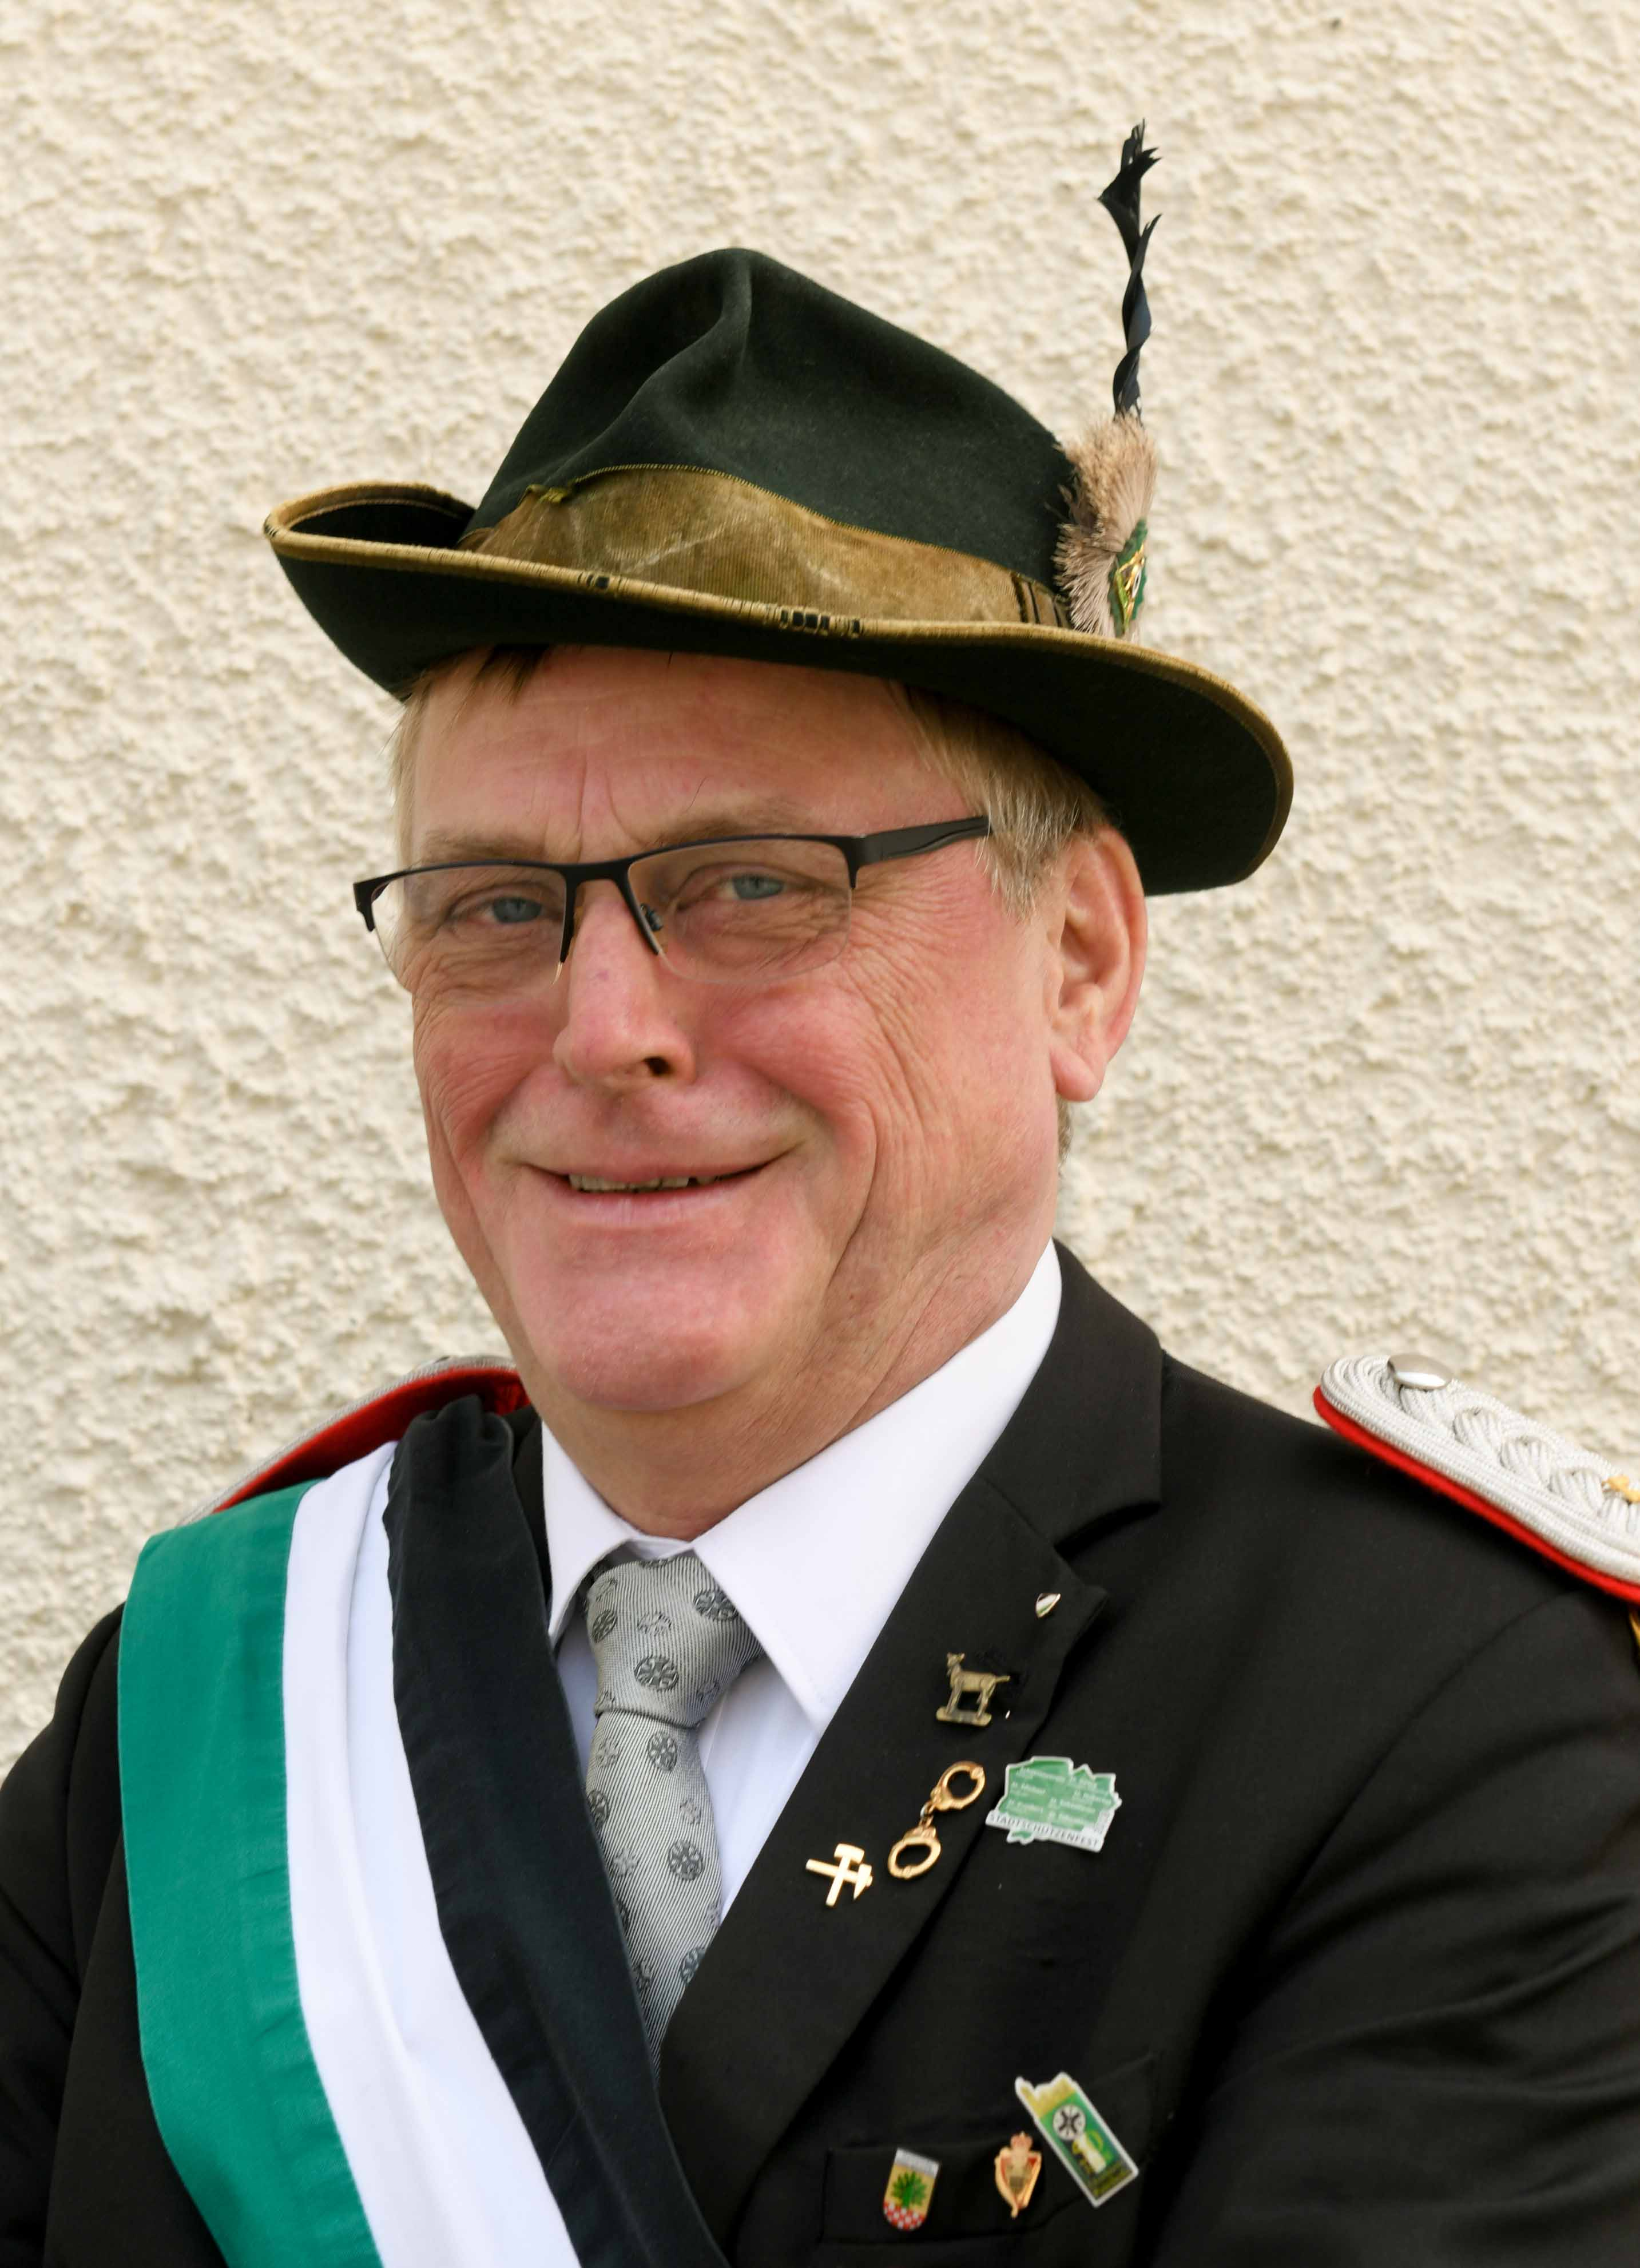 Gerd Kleinert